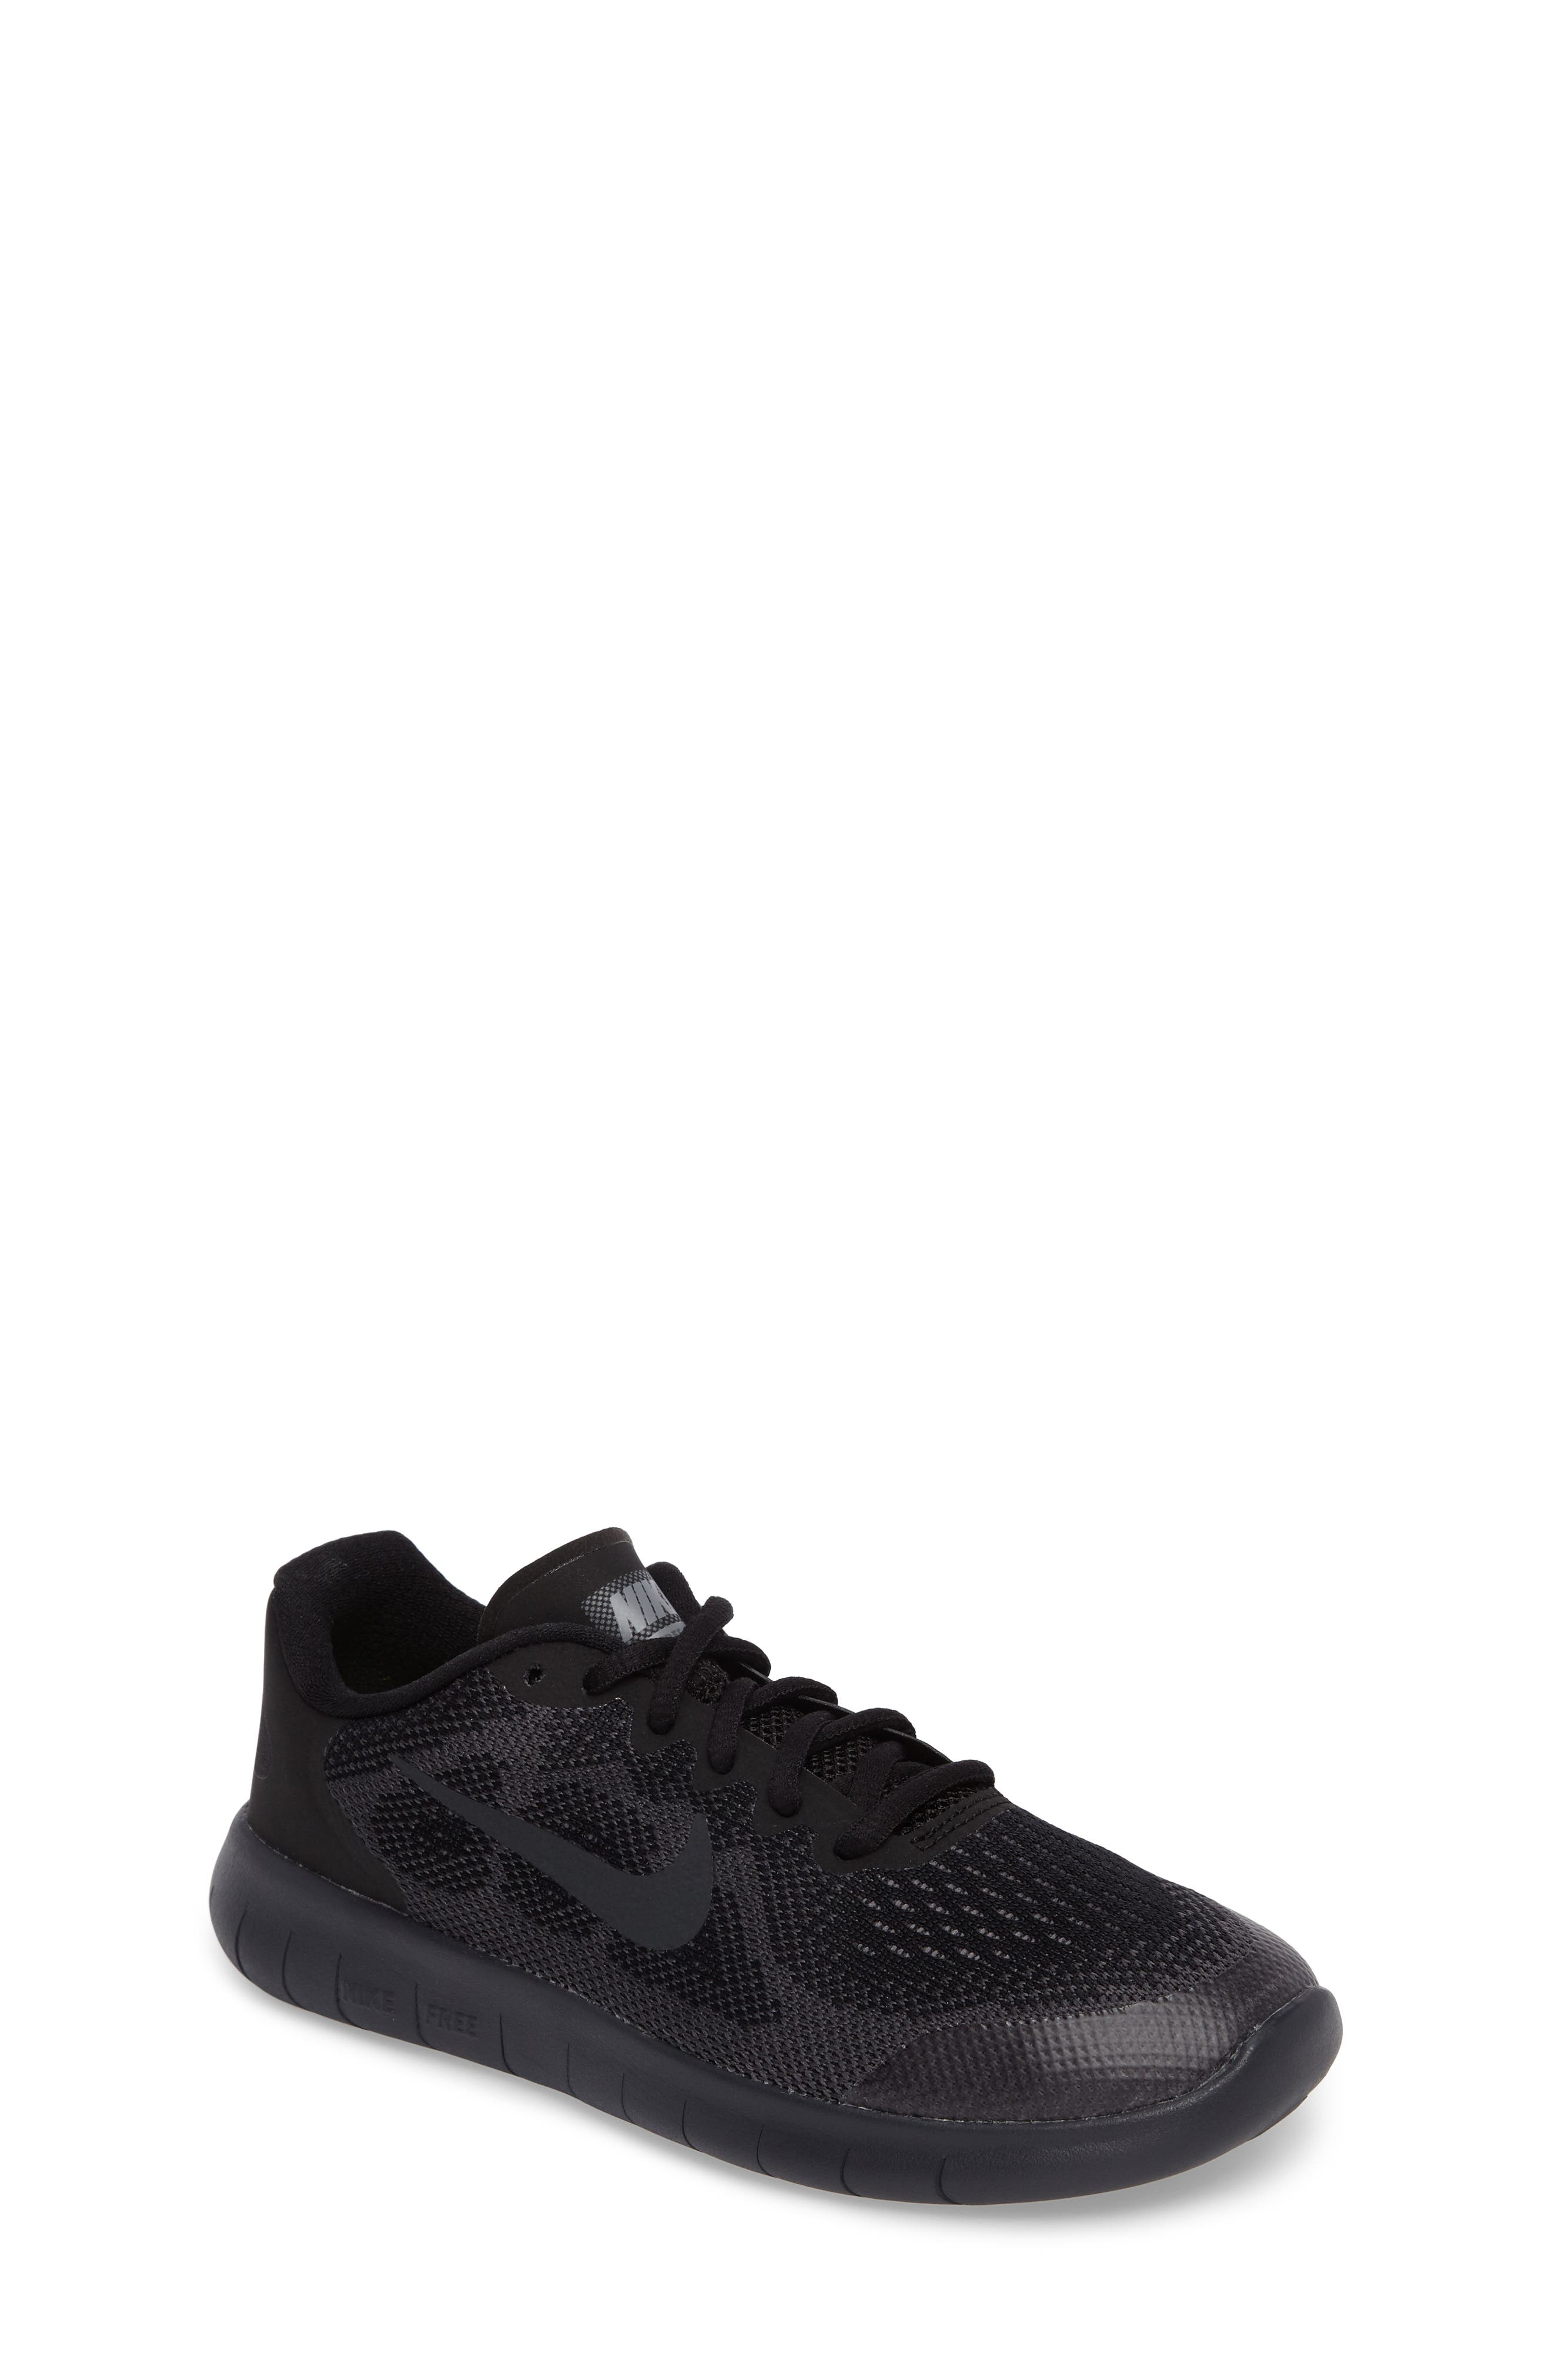 Free RN Running Shoe,                         Main,                         color, Black/ Anthracite/ Dark Grey